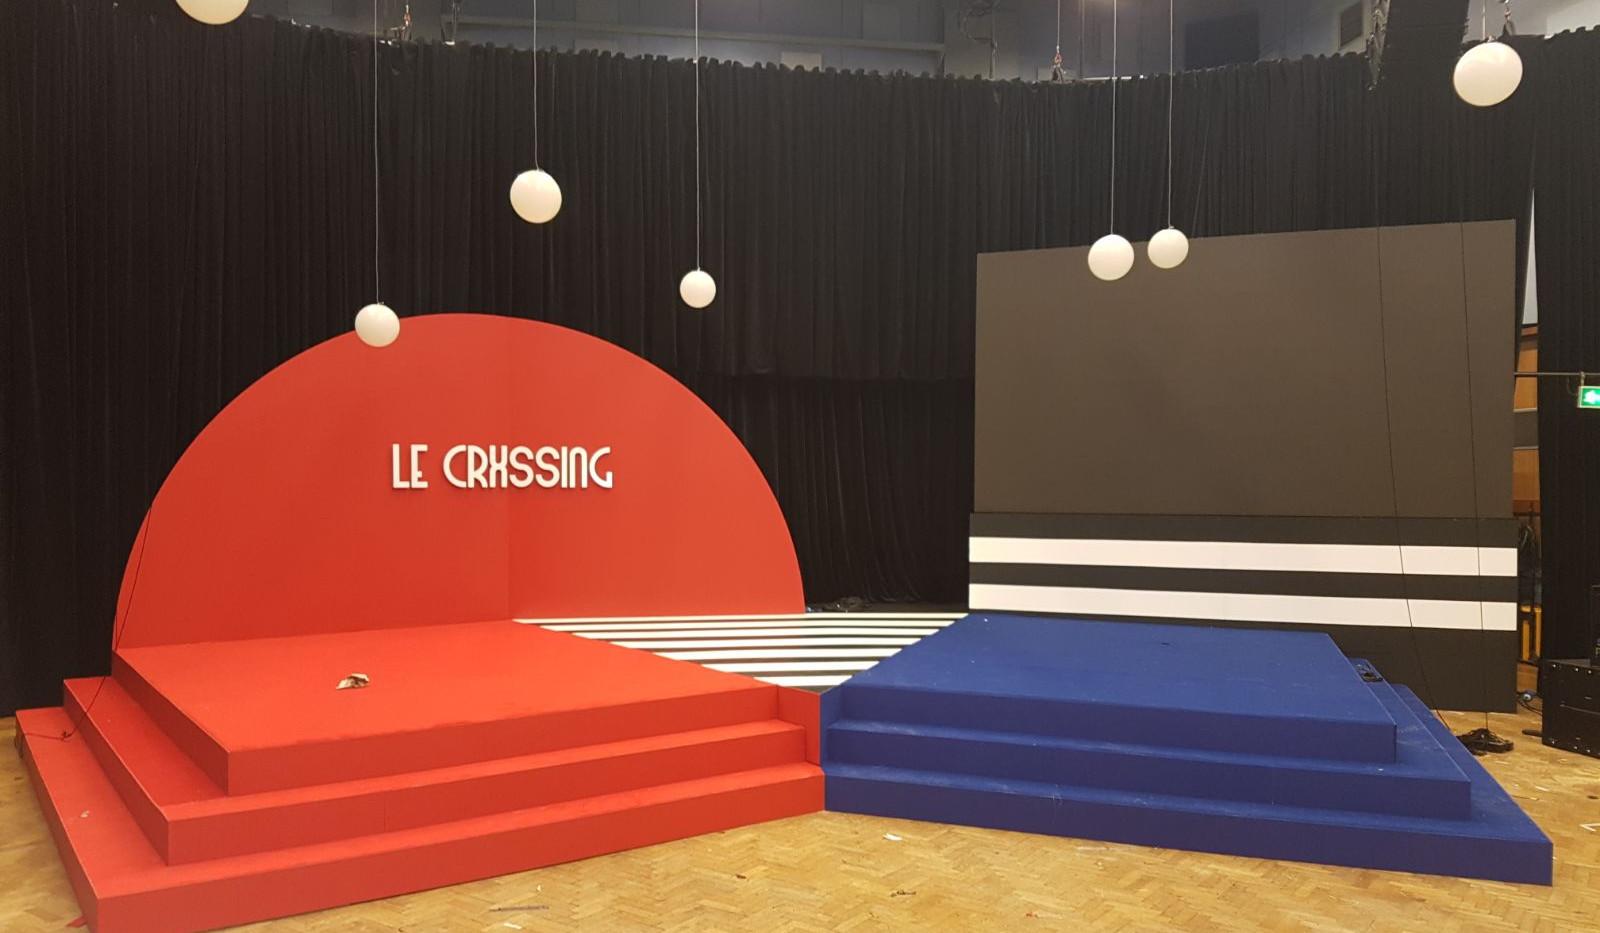 Le crossing